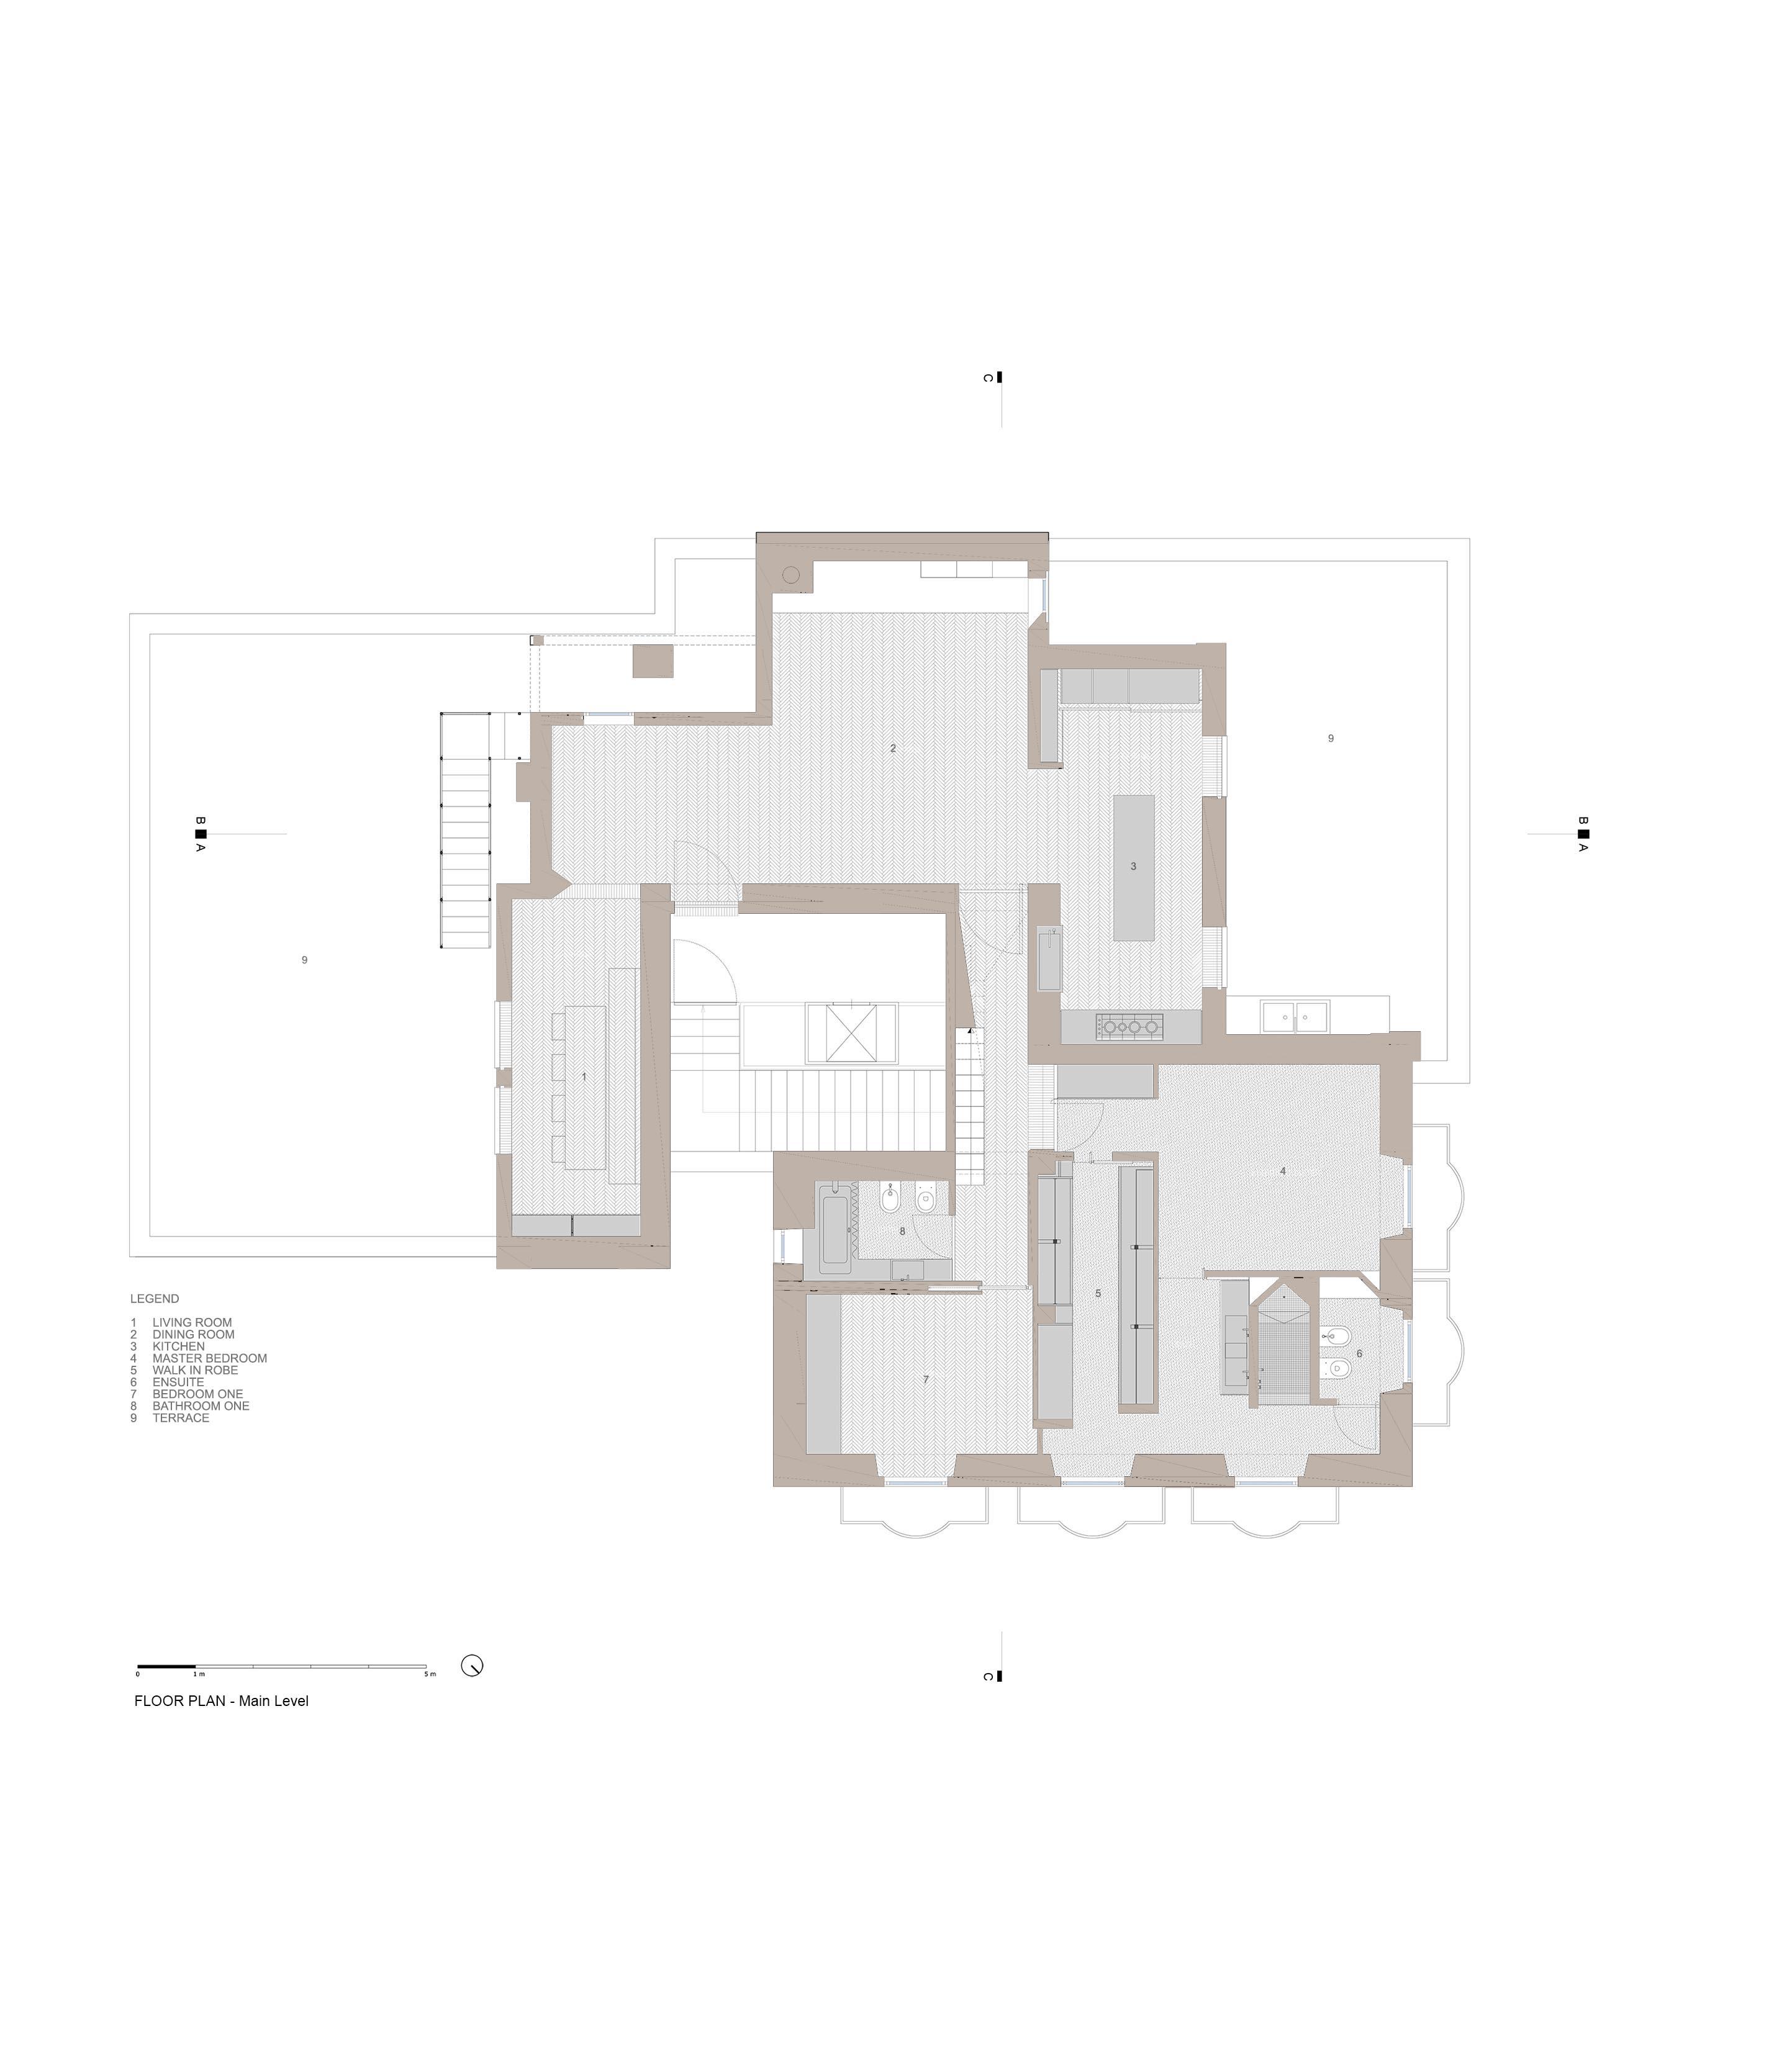 Floor Plan - Main level }